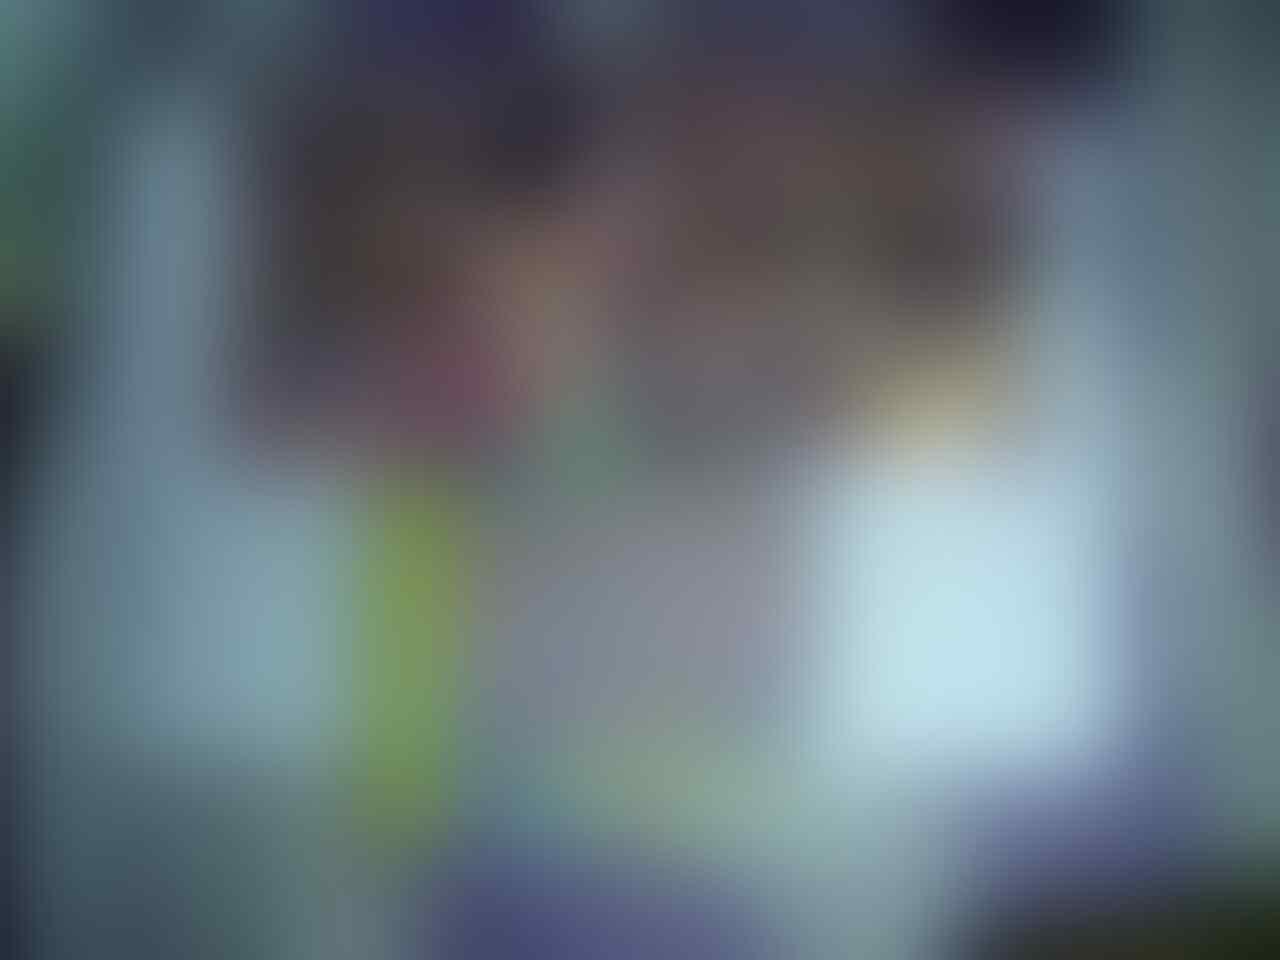 [WTS] SKE48 - Choco no Dorei Limited Edition A,B,C MURAH!!!